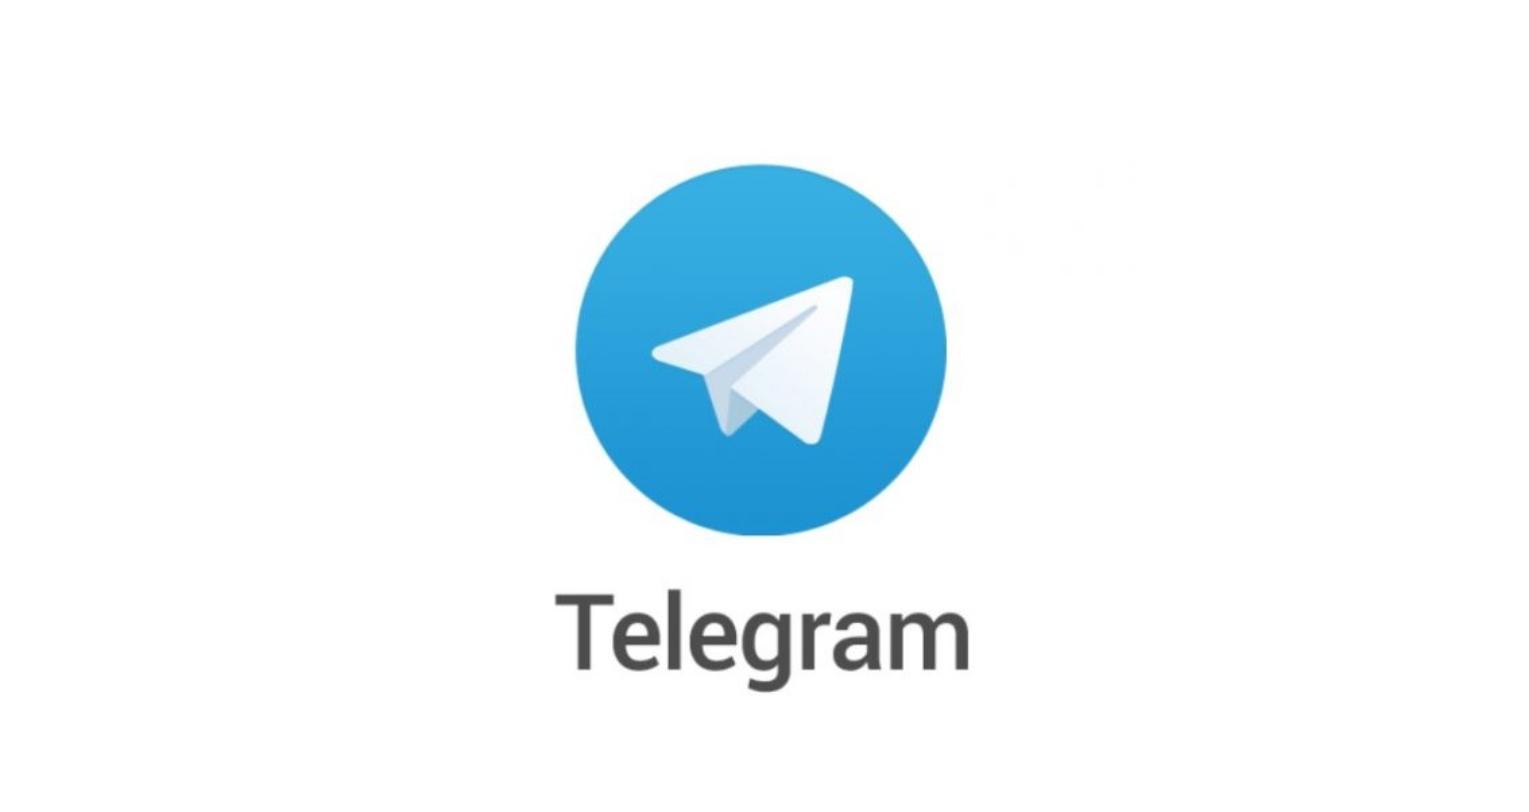 Telegram jako první testuje funkci Announce Messages with Siri